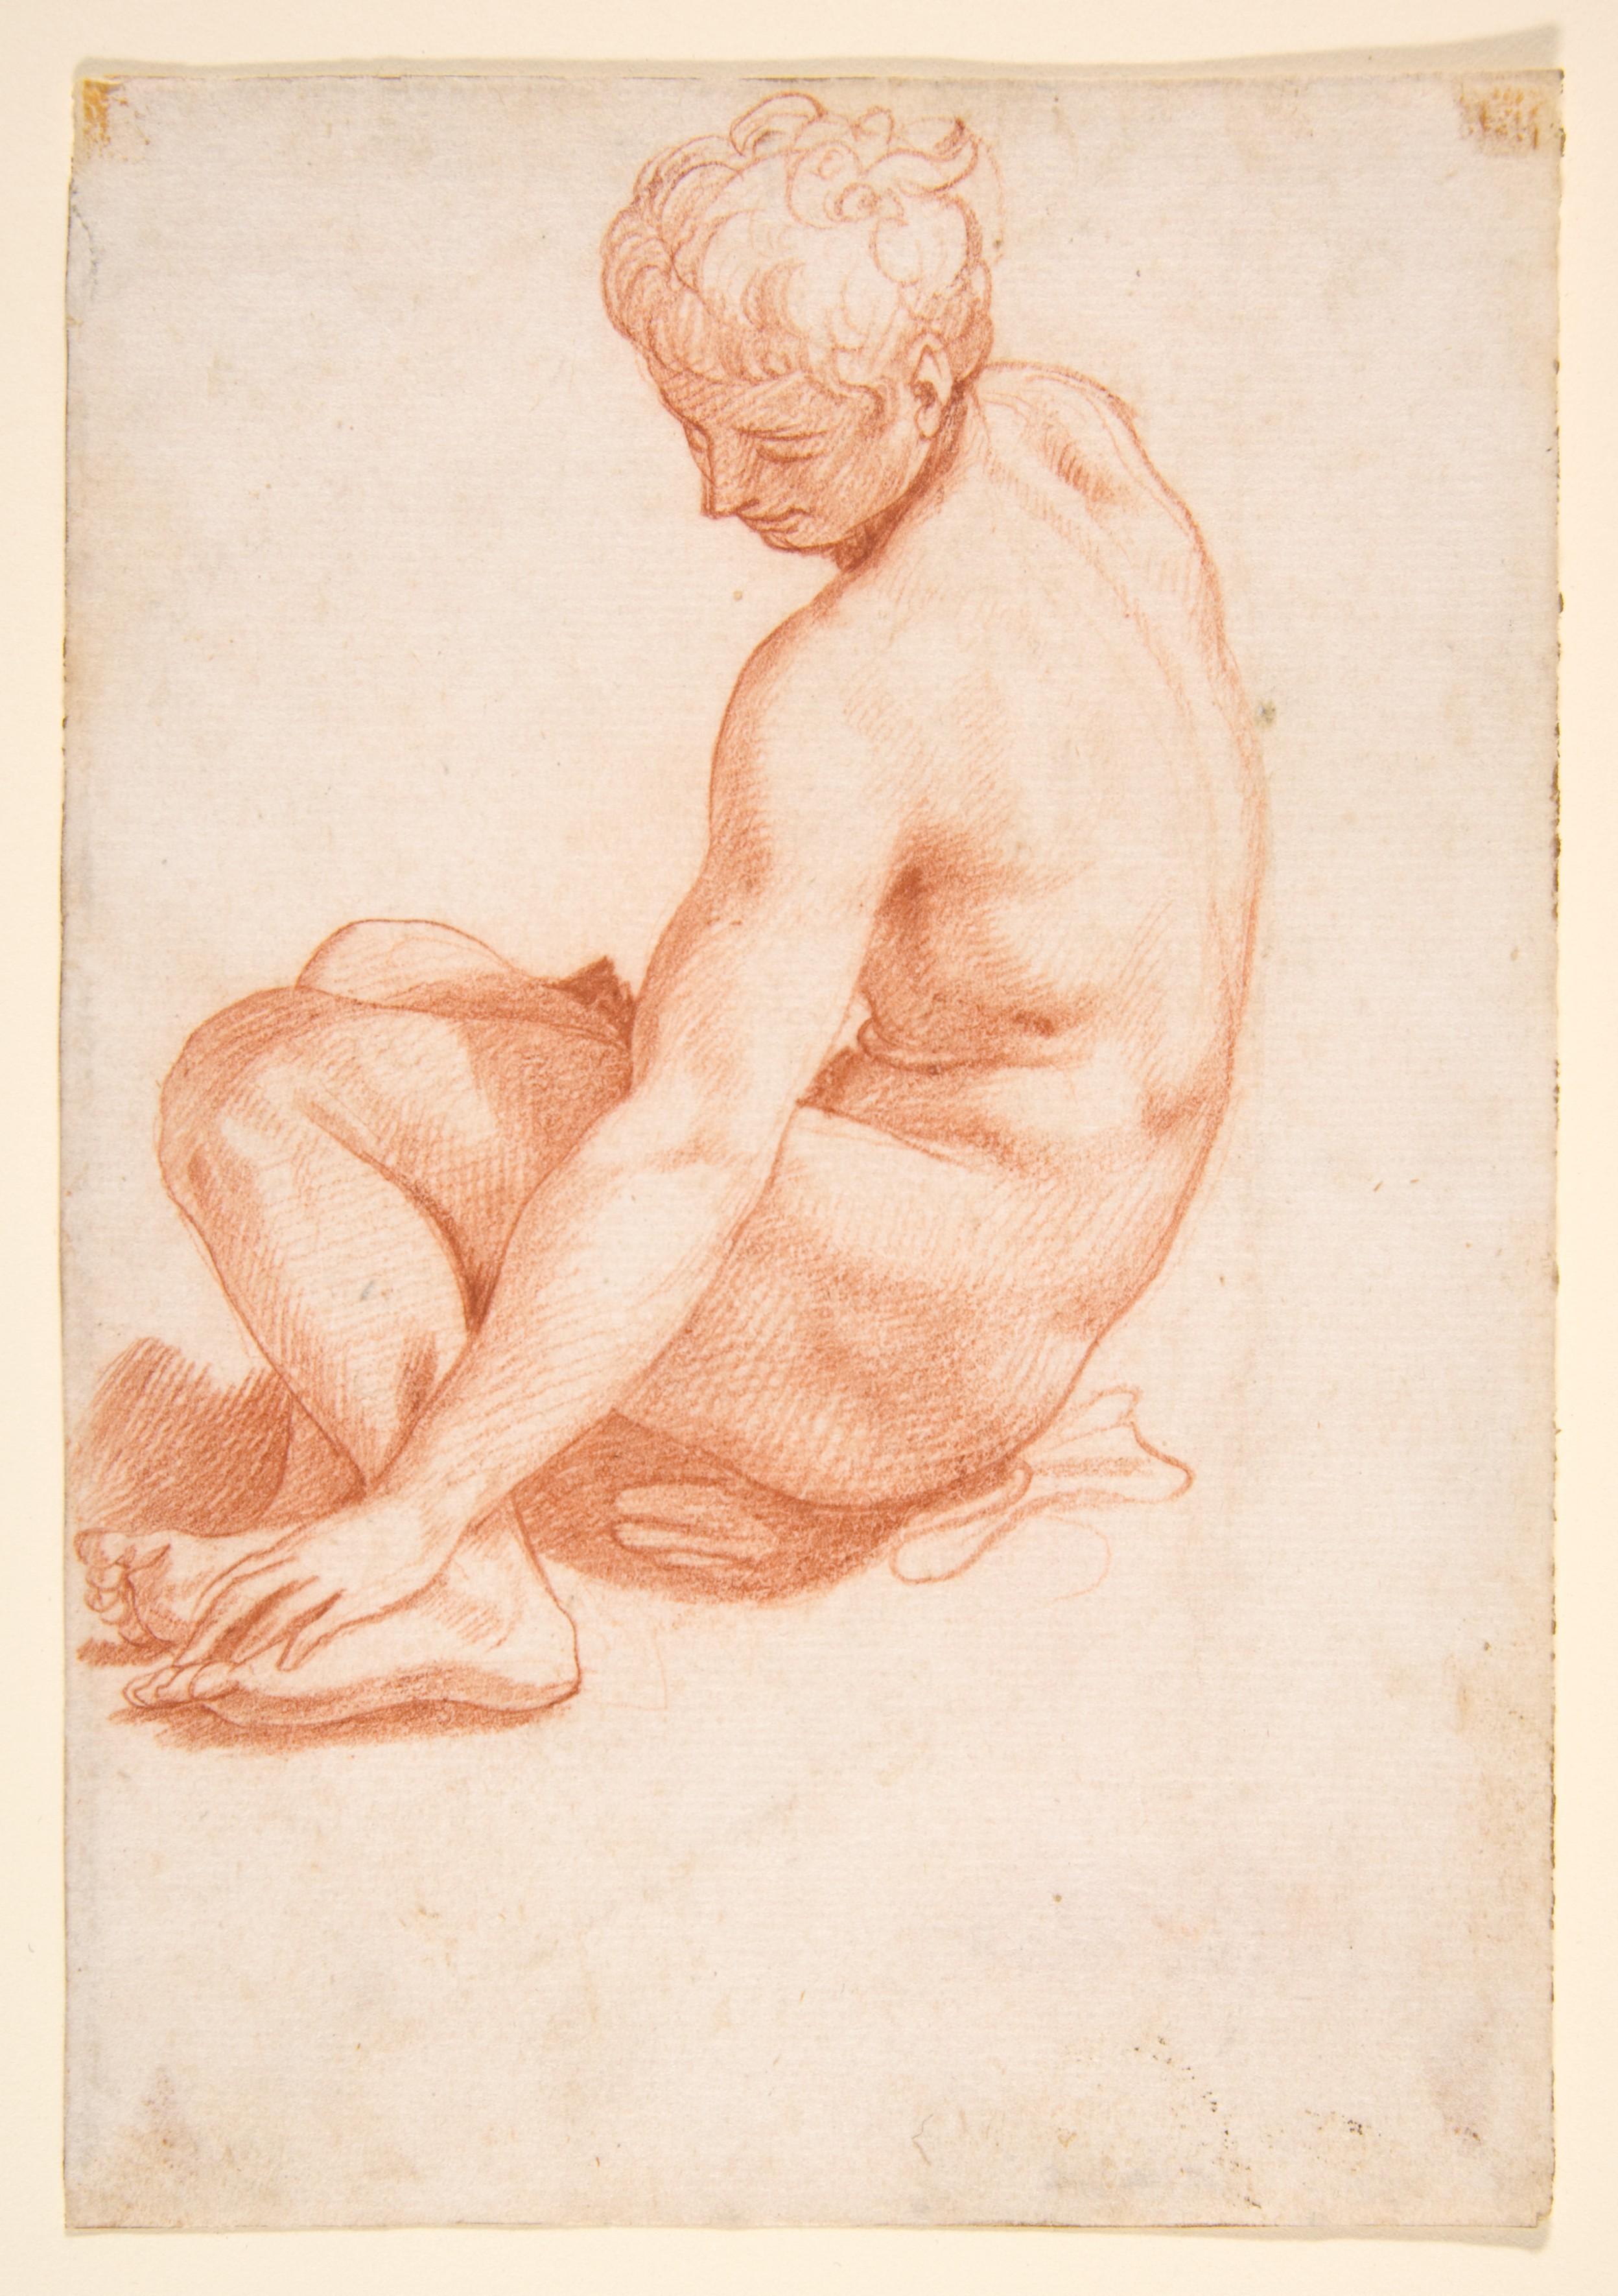 Francesco Salviati Drawings Francesco Salviati Francesco